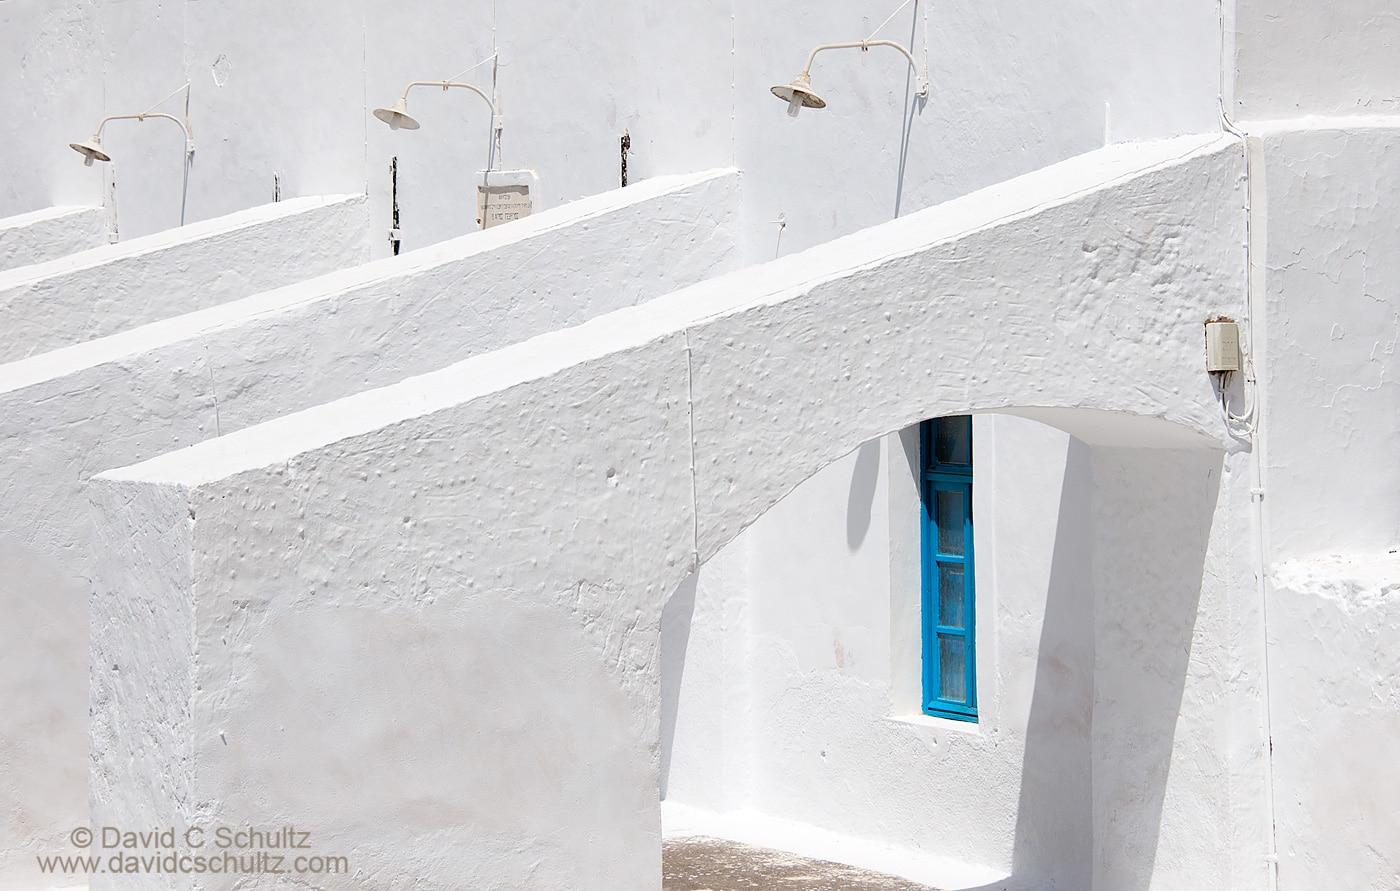 Oia, Santorini, Greece - Image #202-69